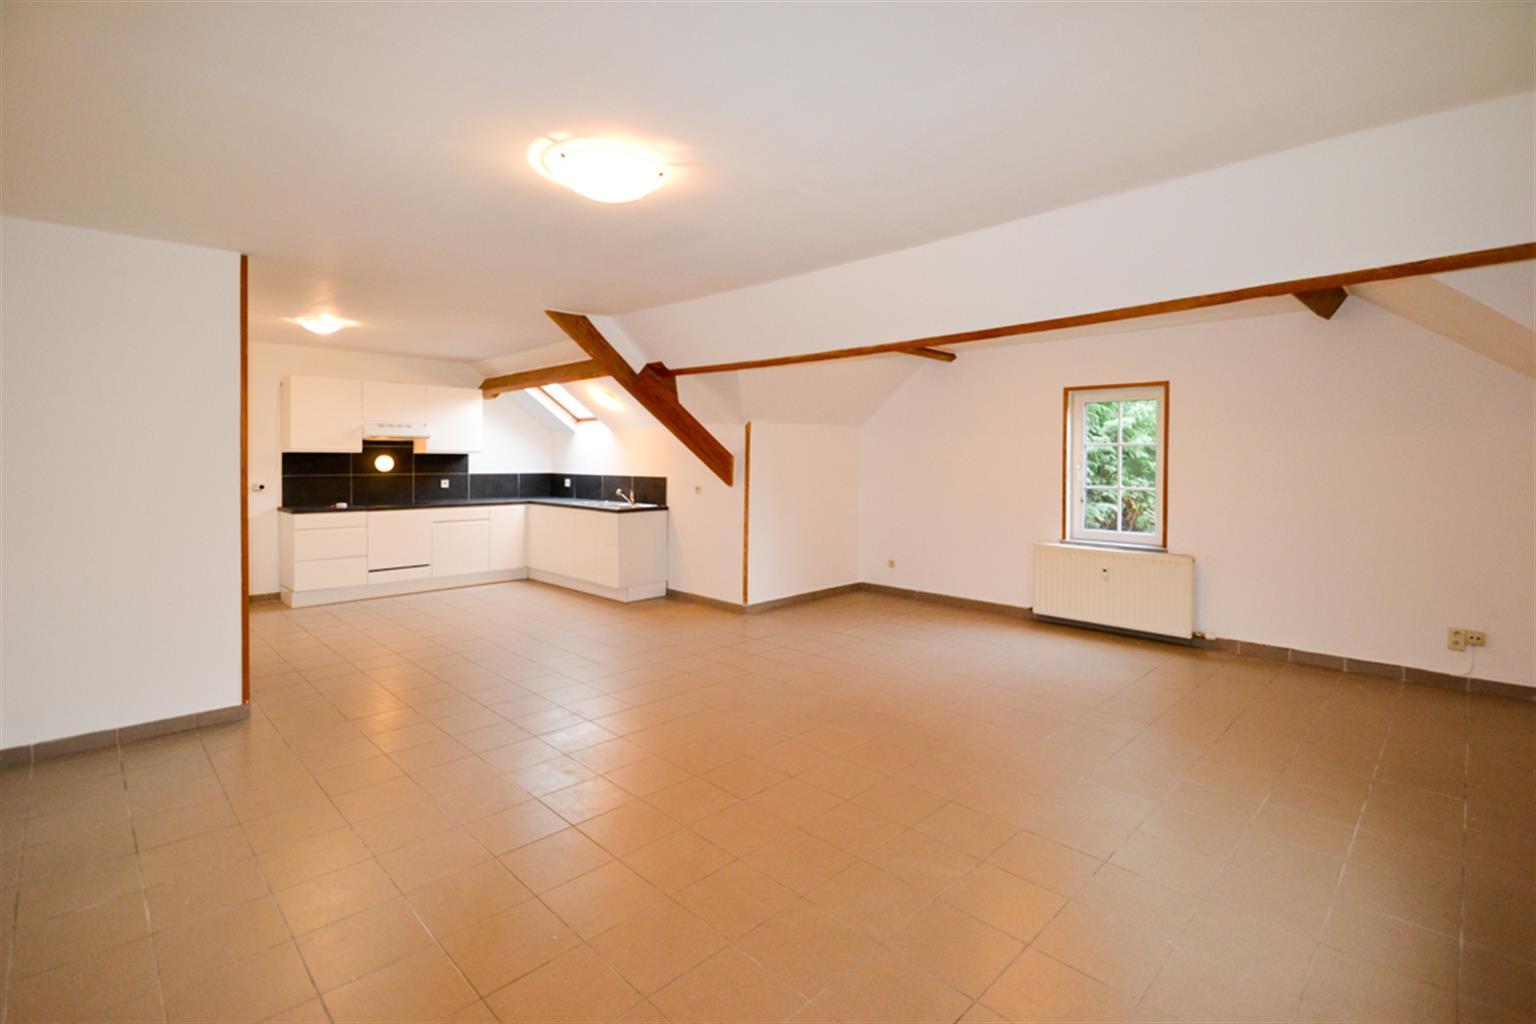 Appartement - Leval-Trahegnies - #3866773-0